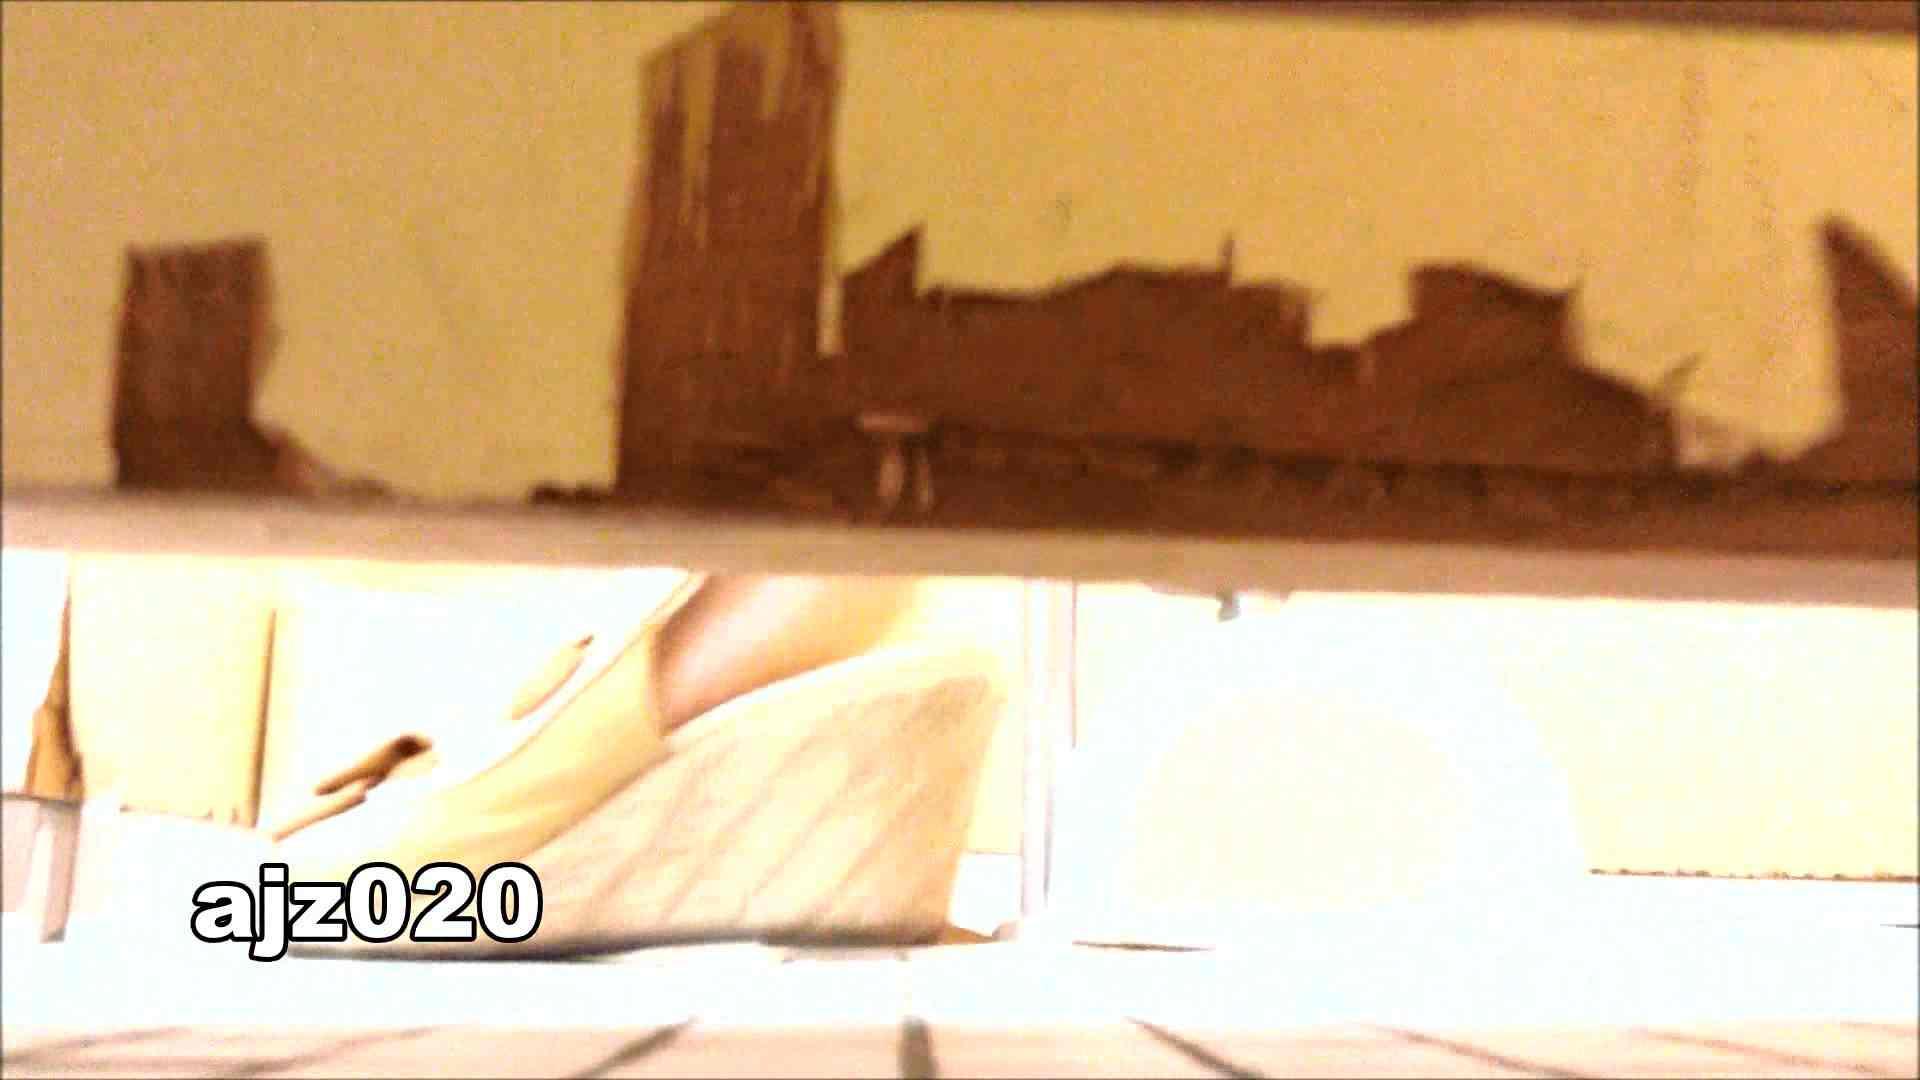 某有名大学女性洗面所 vol.20 排泄 AV動画キャプチャ 101枚 79